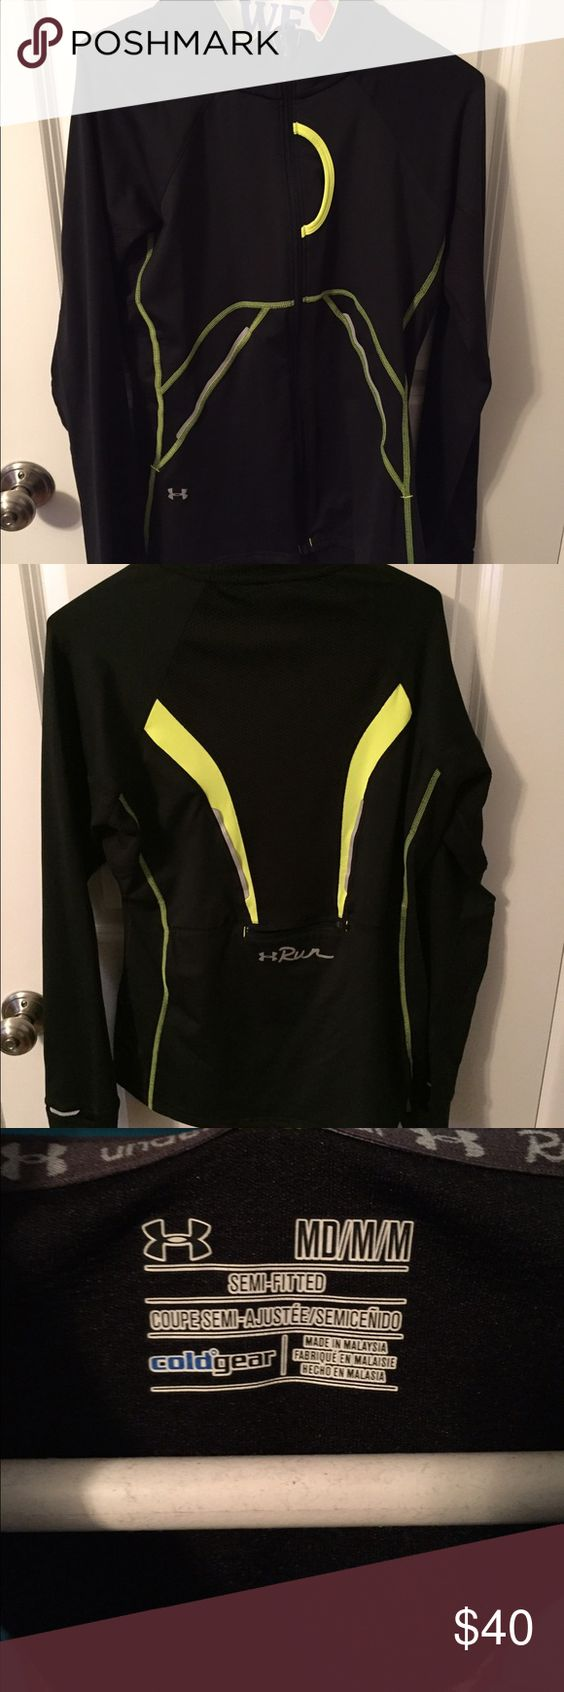 Under armour run series full zip jacket Black and neon green full zip under armour jacket. Worn once! Under Armour Jackets & Coats Utility Jackets